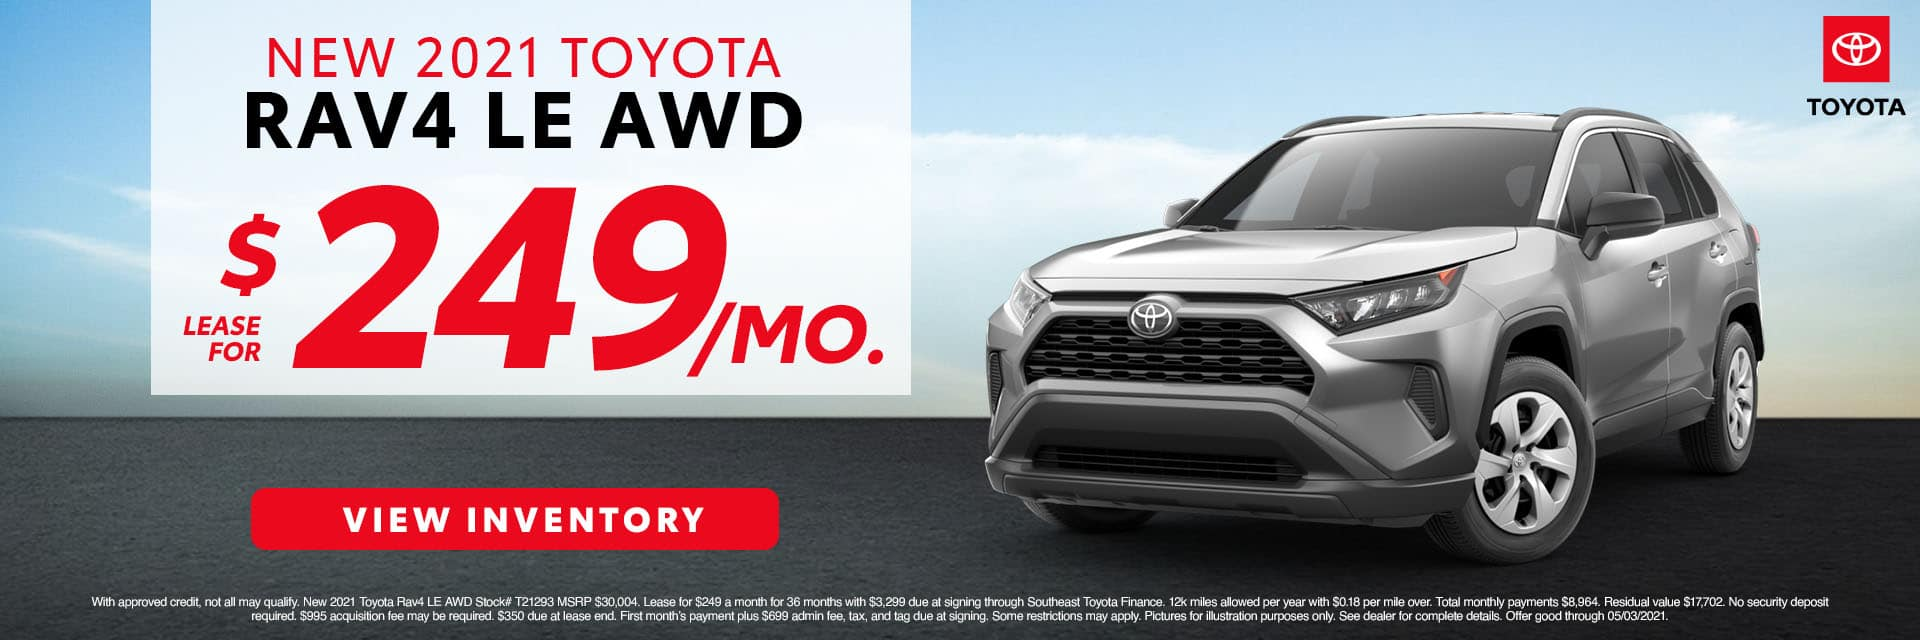 CLTW-April 2021-2021 Toyota Rav4